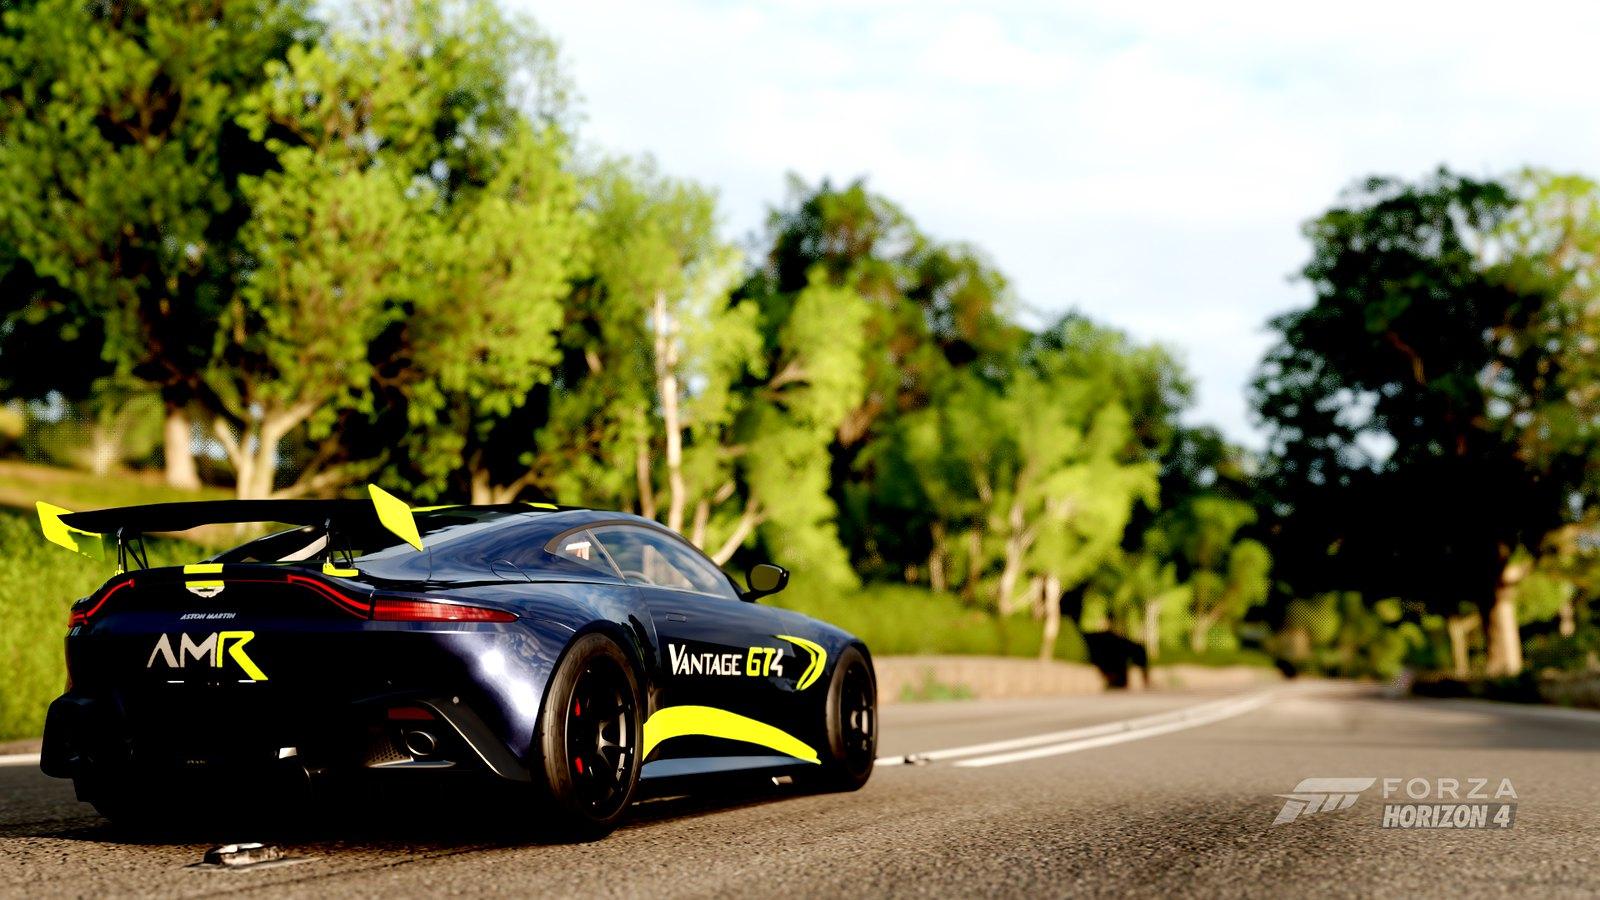 45133850025_8ac86678cc_h ForzaMotorsport.fr